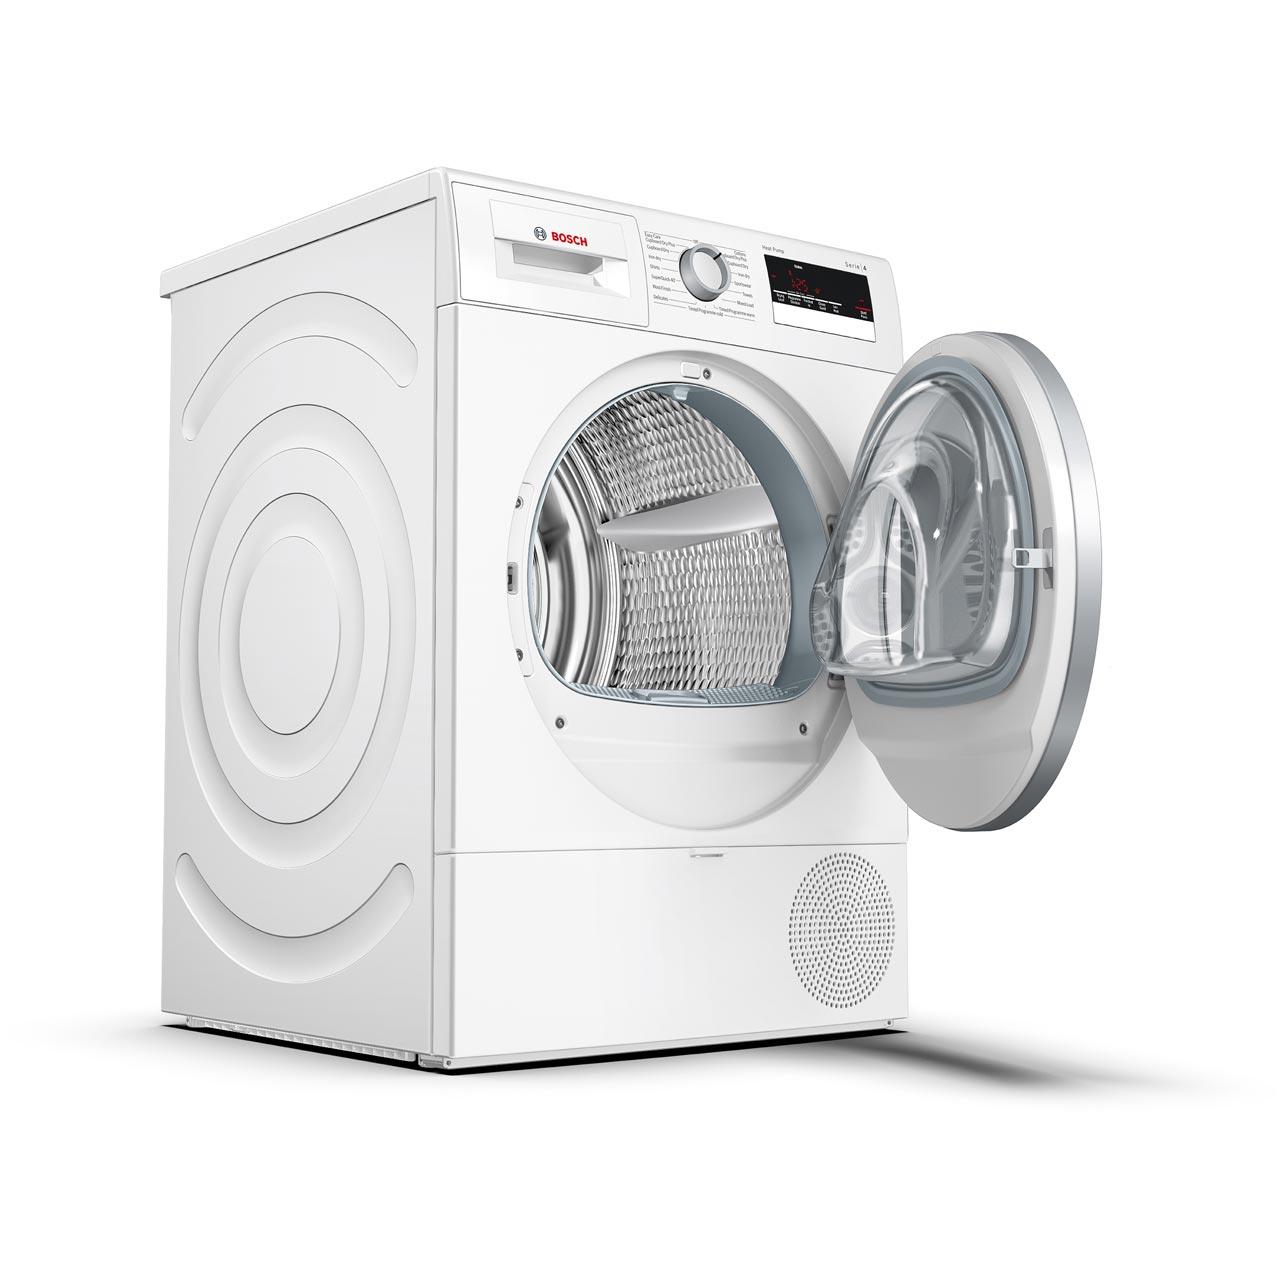 bosch serie 6 tumble dryer manual